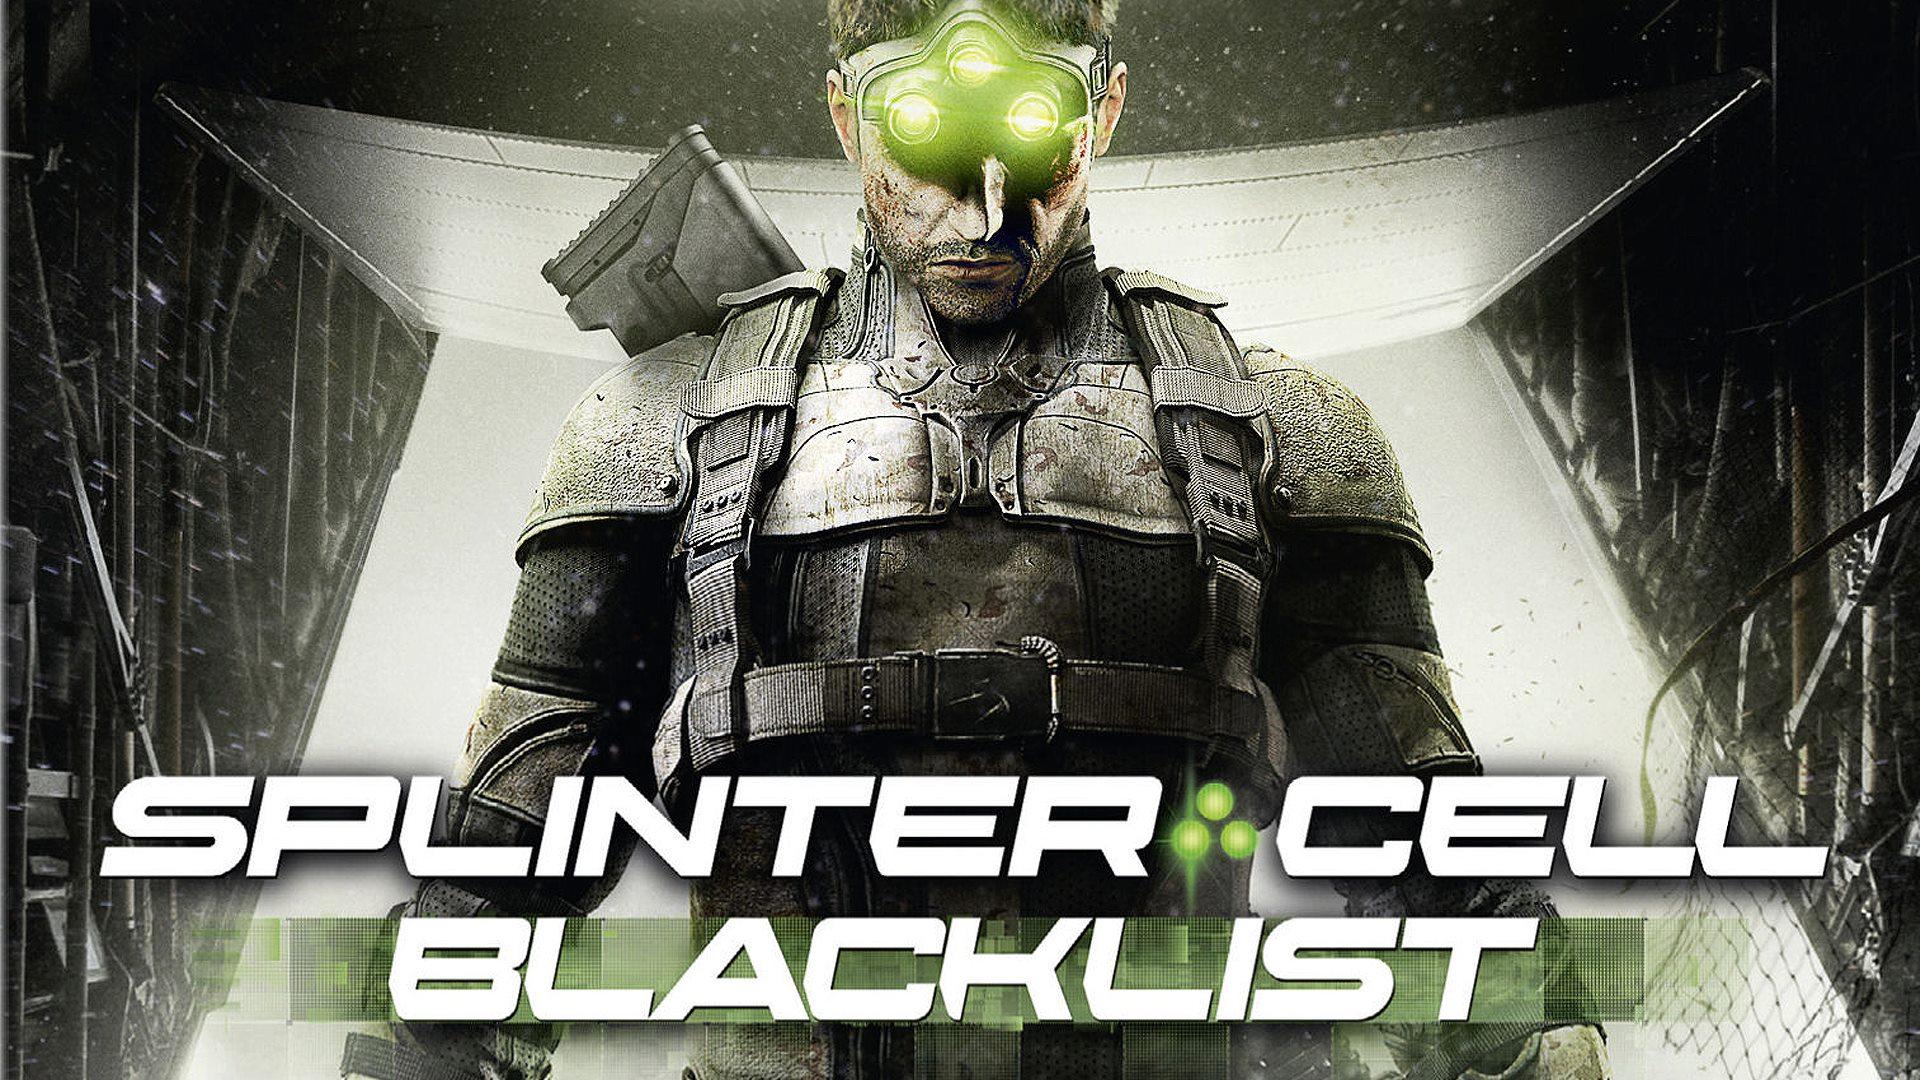 Este trailer de Splinter Cell: Blacklist te permite ser un fantasma, un asalto o una gata loca (A.K.A. pantera) [Vídeo]